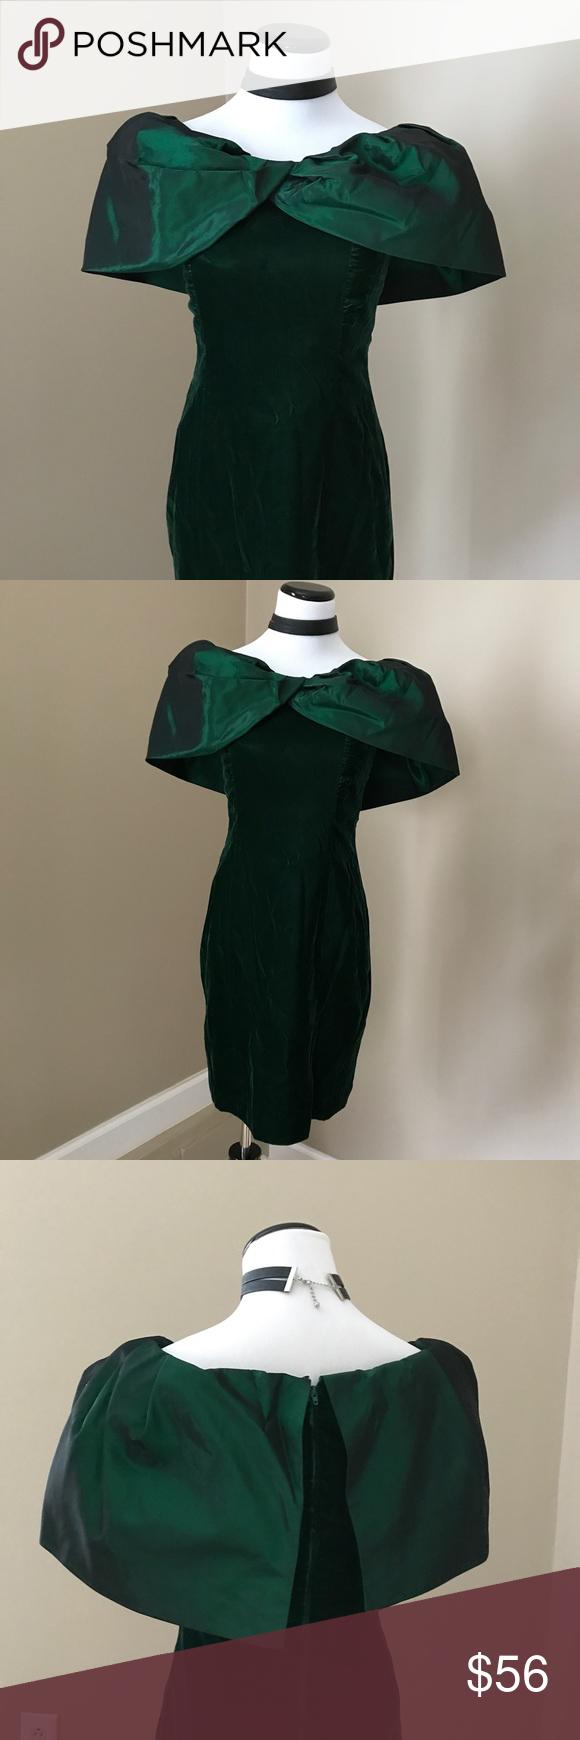 Vintage us prom party green dress my posh picks pinterest